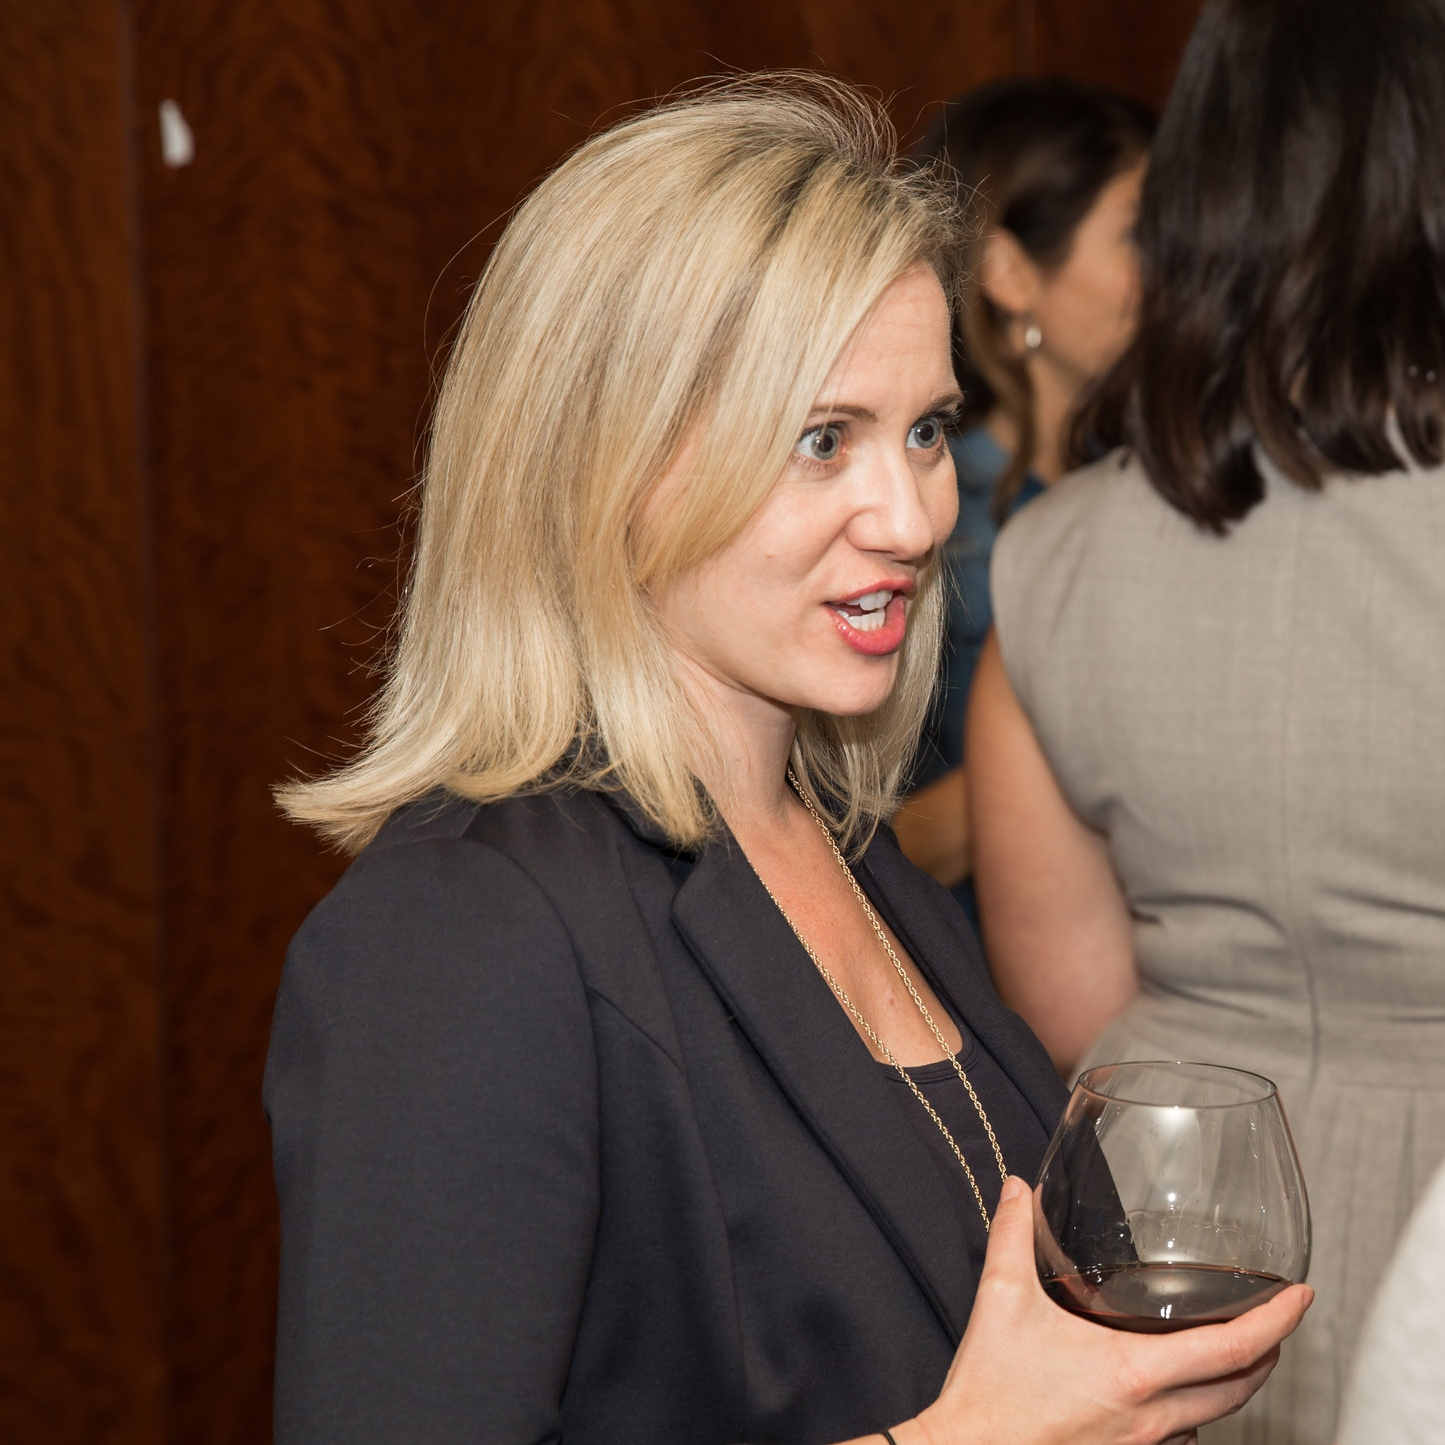 Allison Macleod, Senior Demand Generation, Business Development & Customer Advocacy Leader, Rapid 7 and 2017 Rev Boston honoree